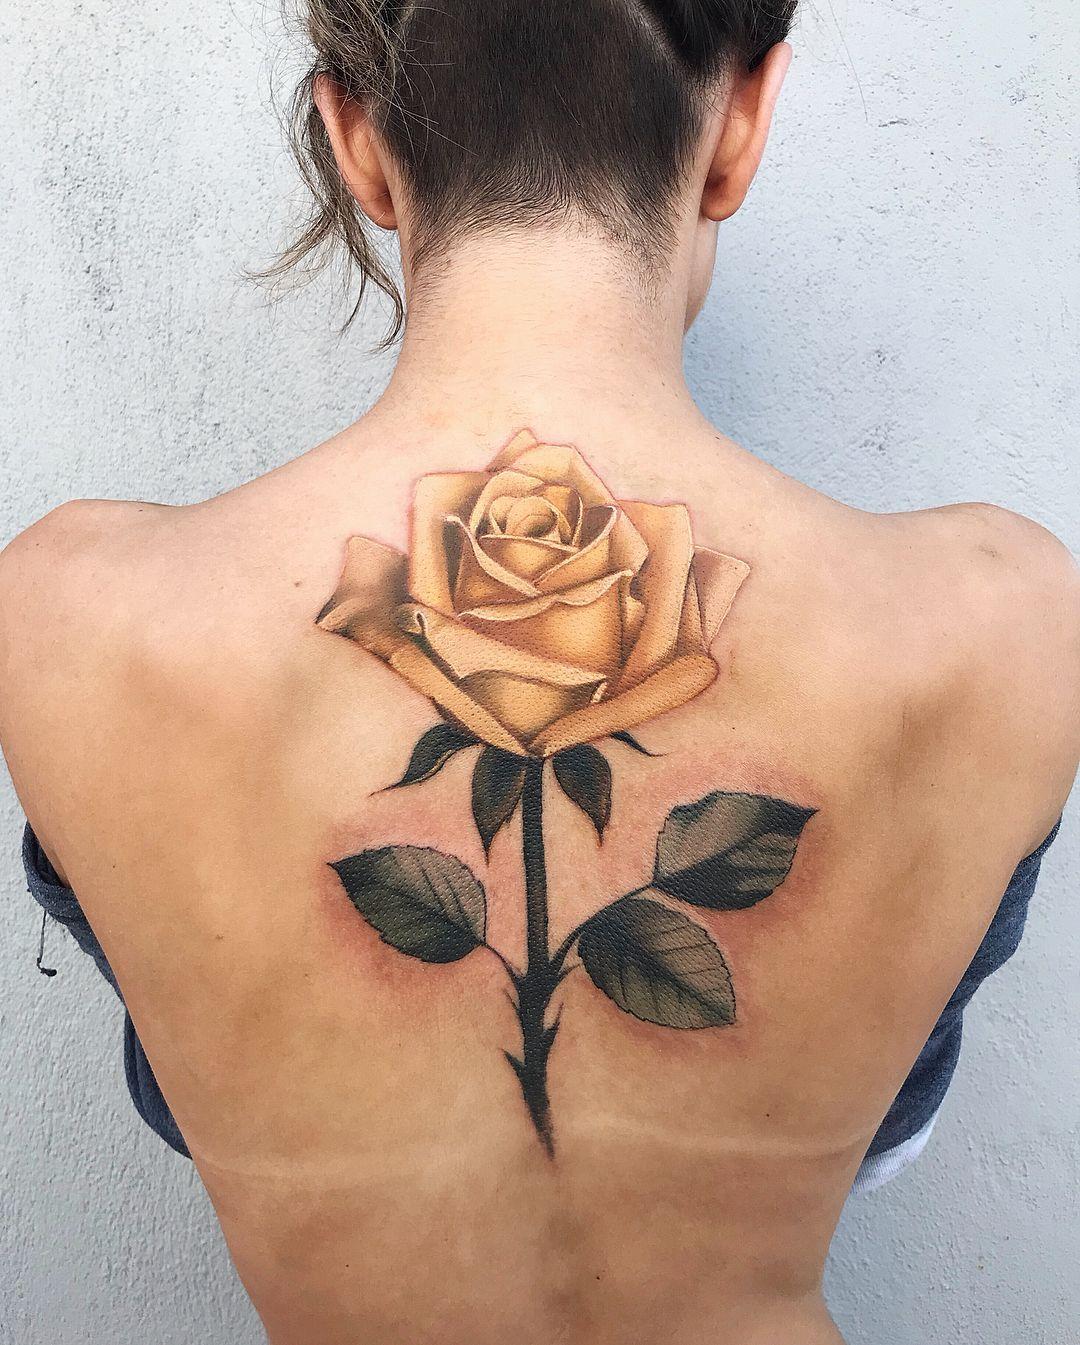 Beautiful Yellow Rose Tattoo On Back C Tattoo Artist Pony Wave Yellow Rose Tattoos Rose Tattoo Design Rose Tattoos For Women